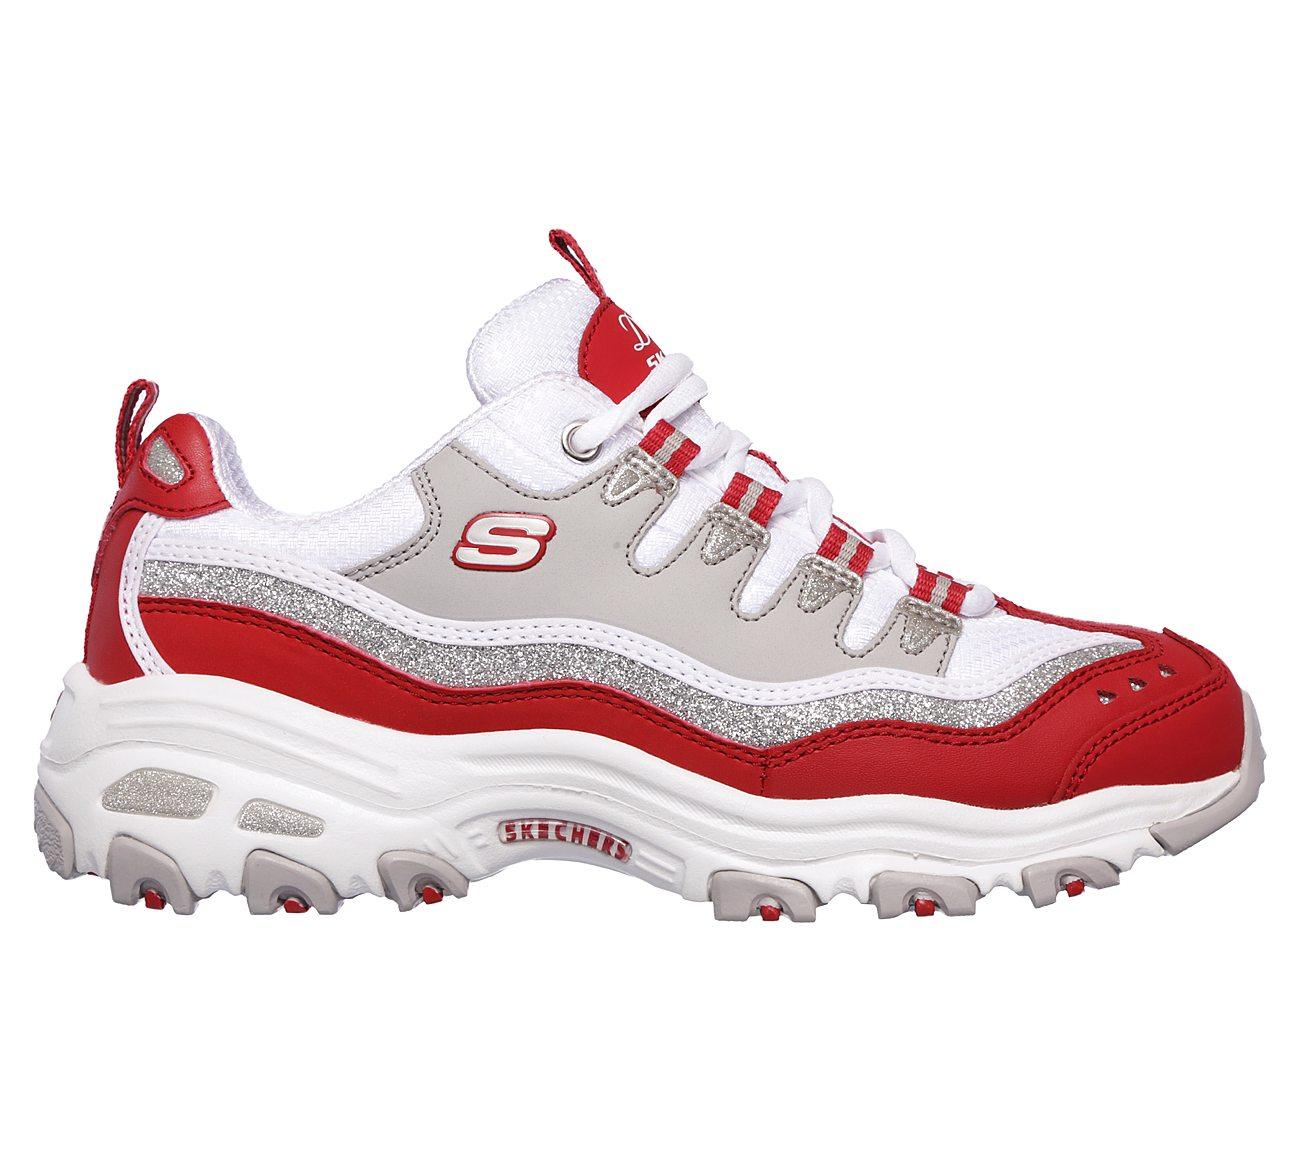 Top Womens Skechers Shoes Skechers D'Lites New Retro